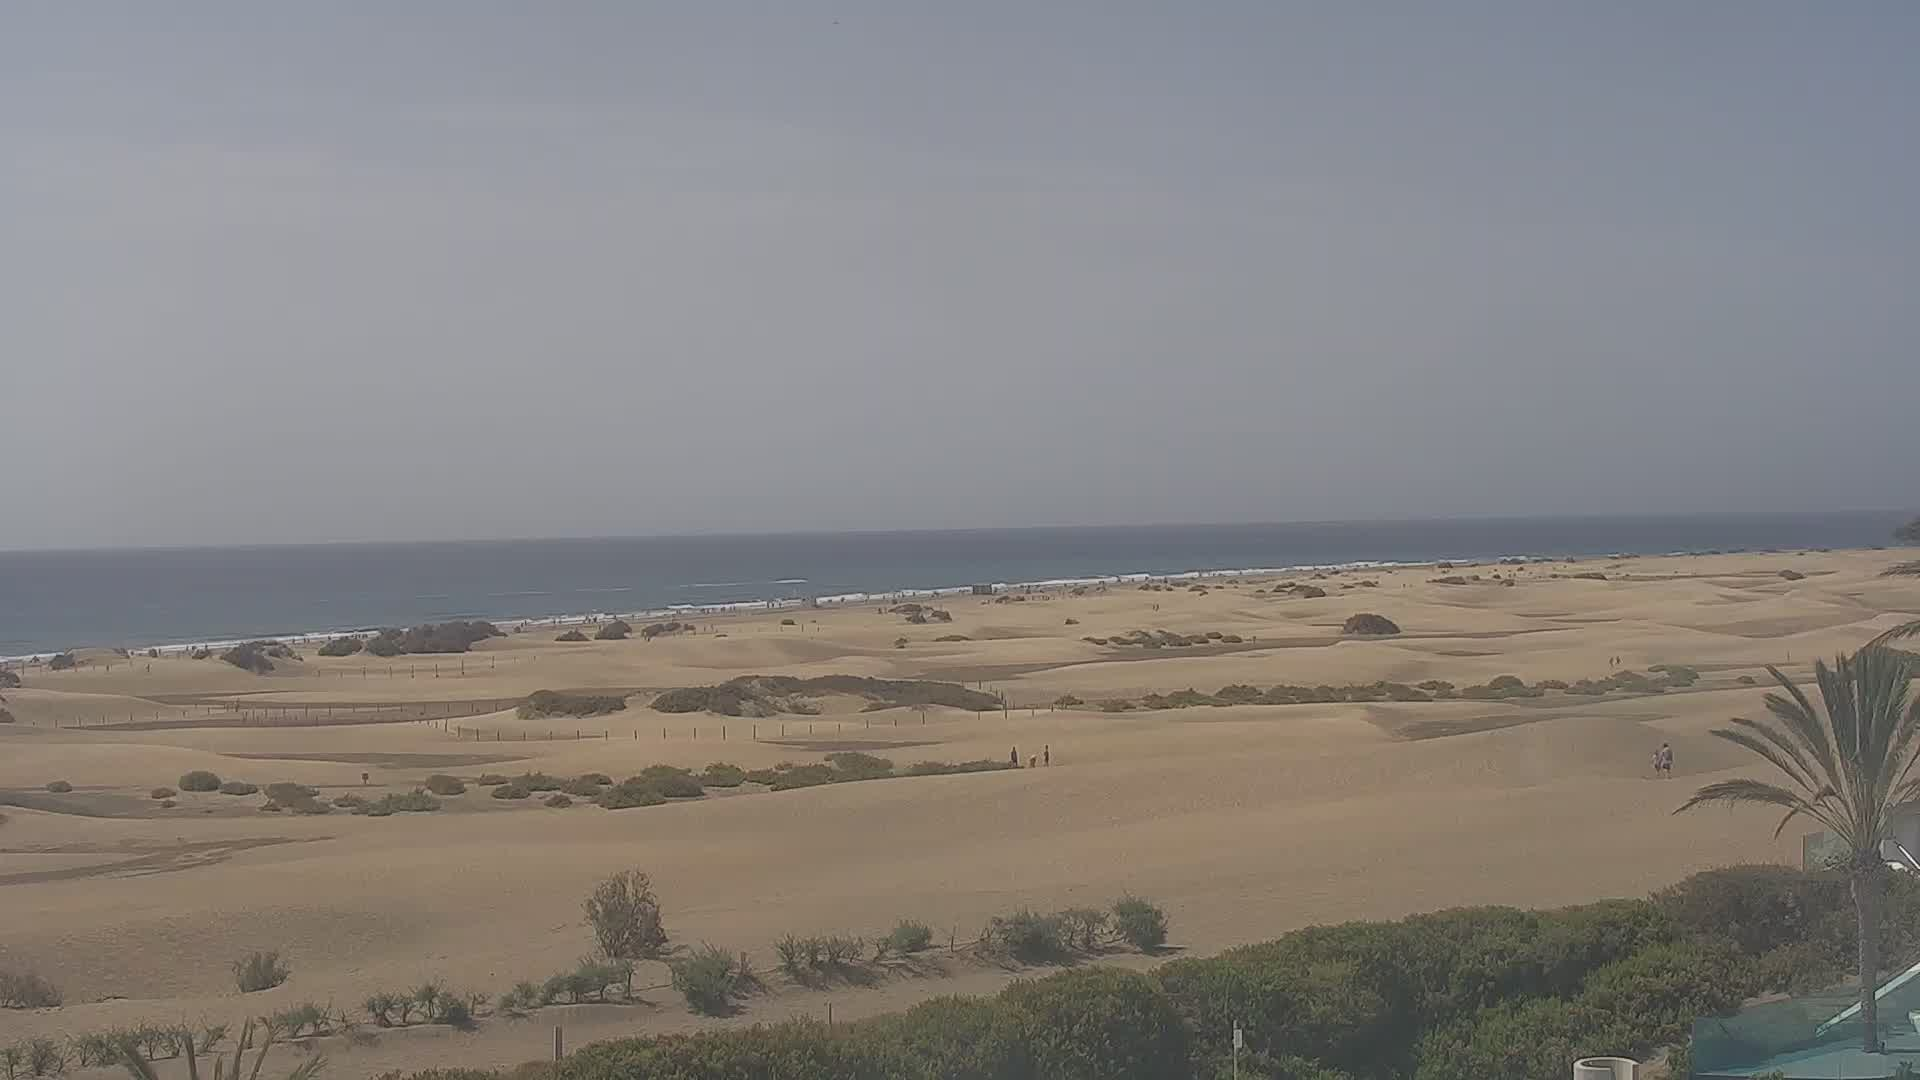 Playa del Ingles (Gran Canaria) Sat. 11:36